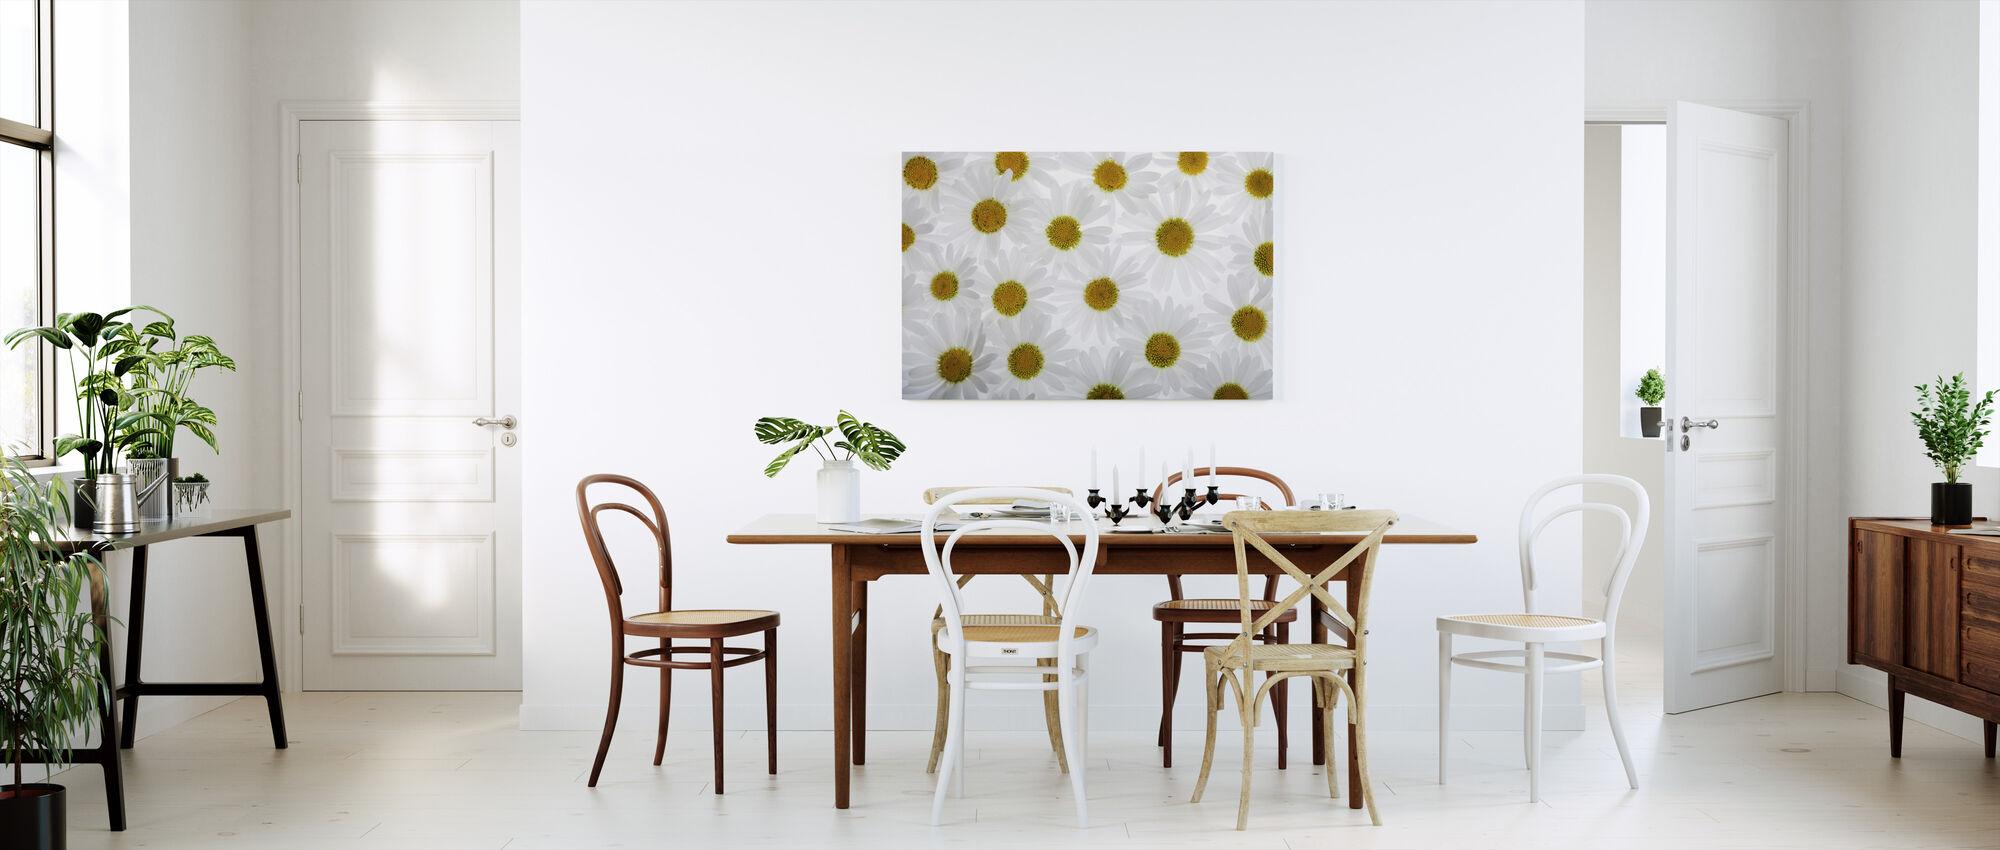 Floor of White Flowers - Canvas print - Kitchen